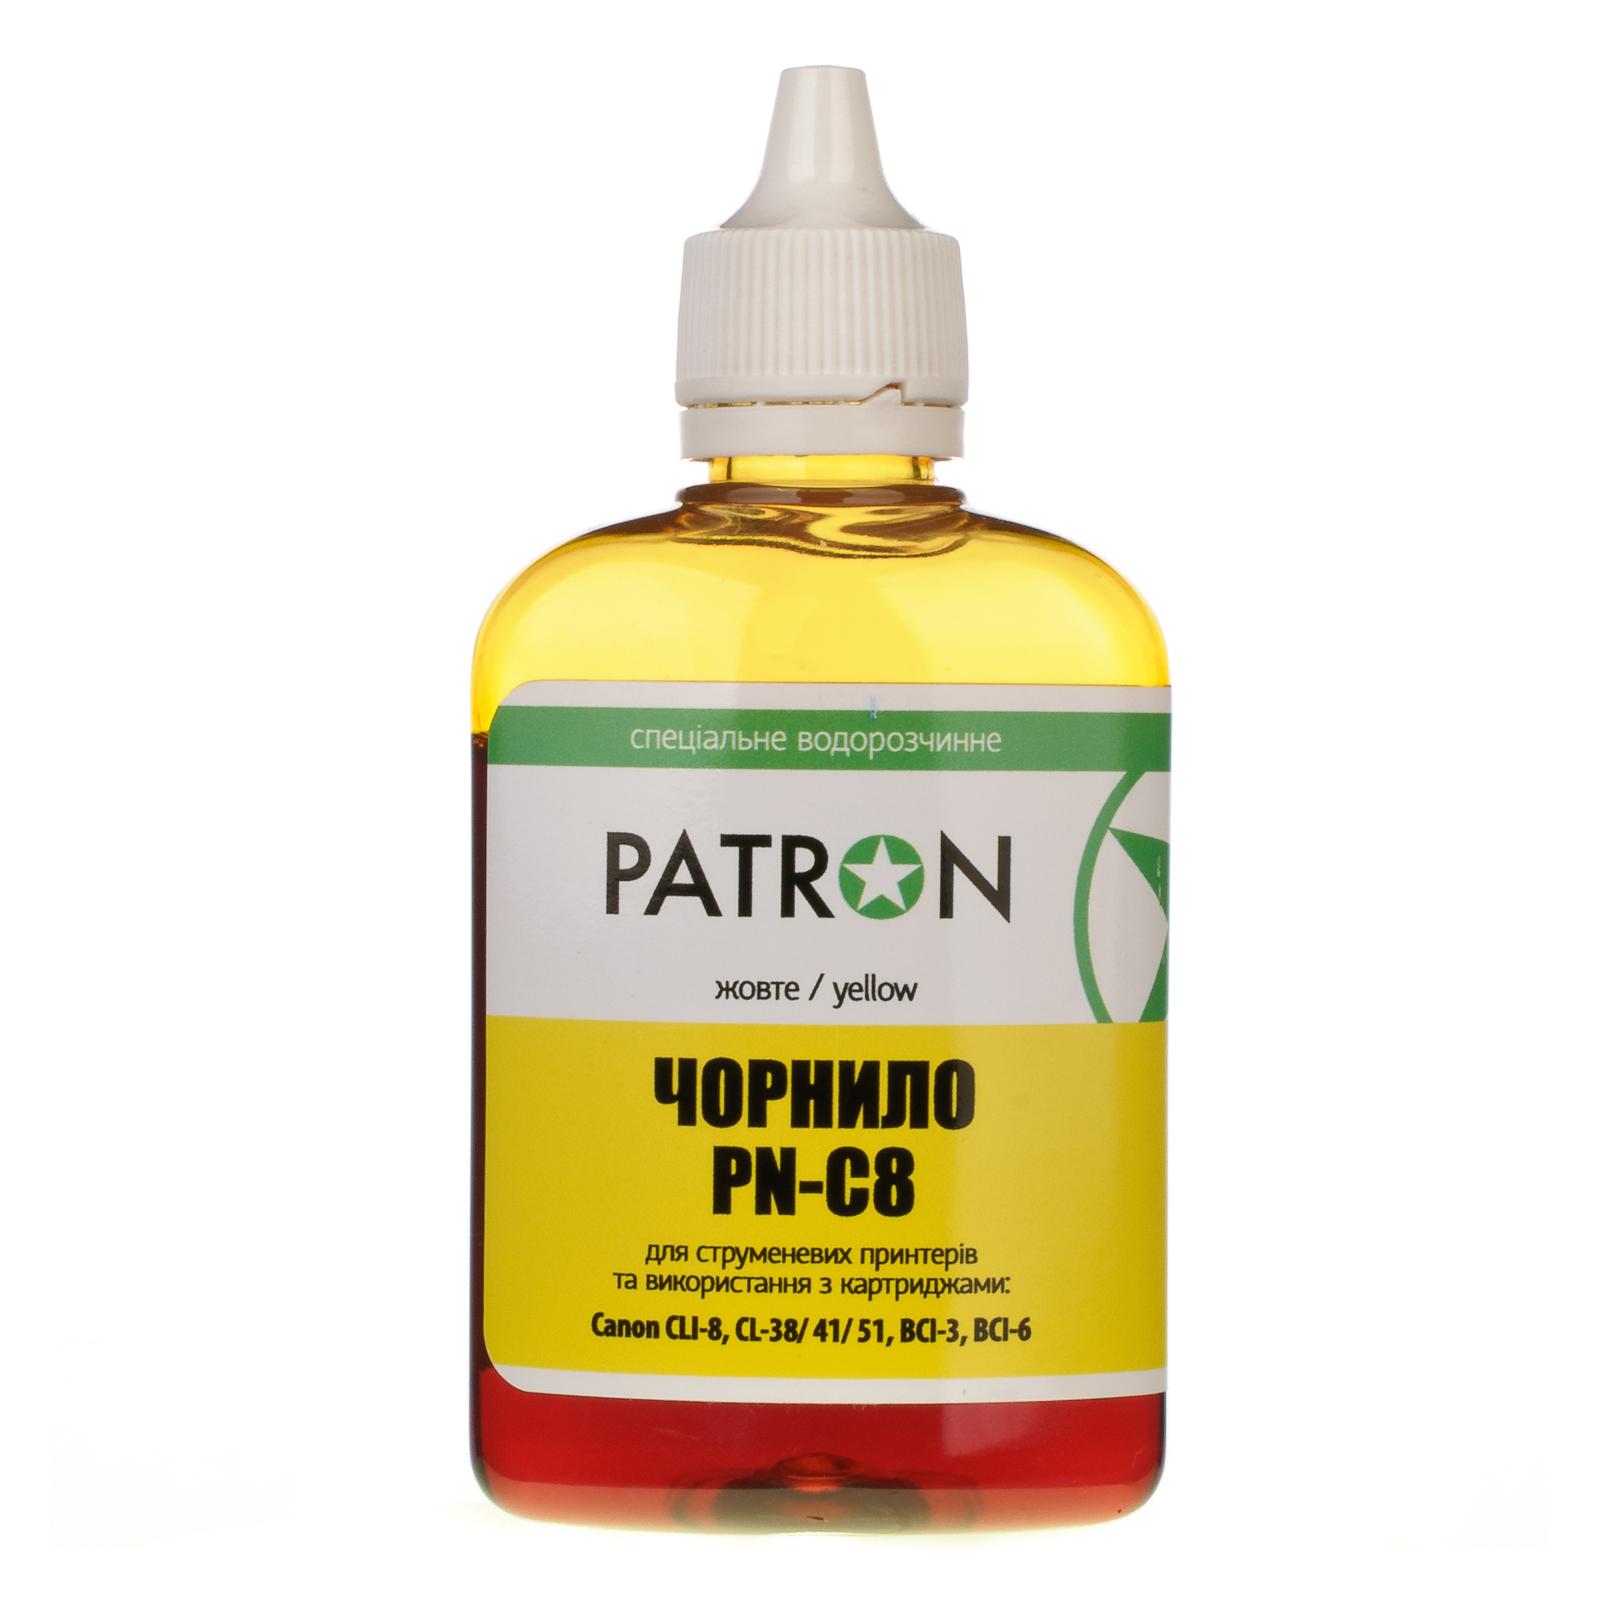 Чернила PATRON CANON CLI-8 90г YELLOW (PN-C8-292) (I-PN-CCLI8-090-Y)